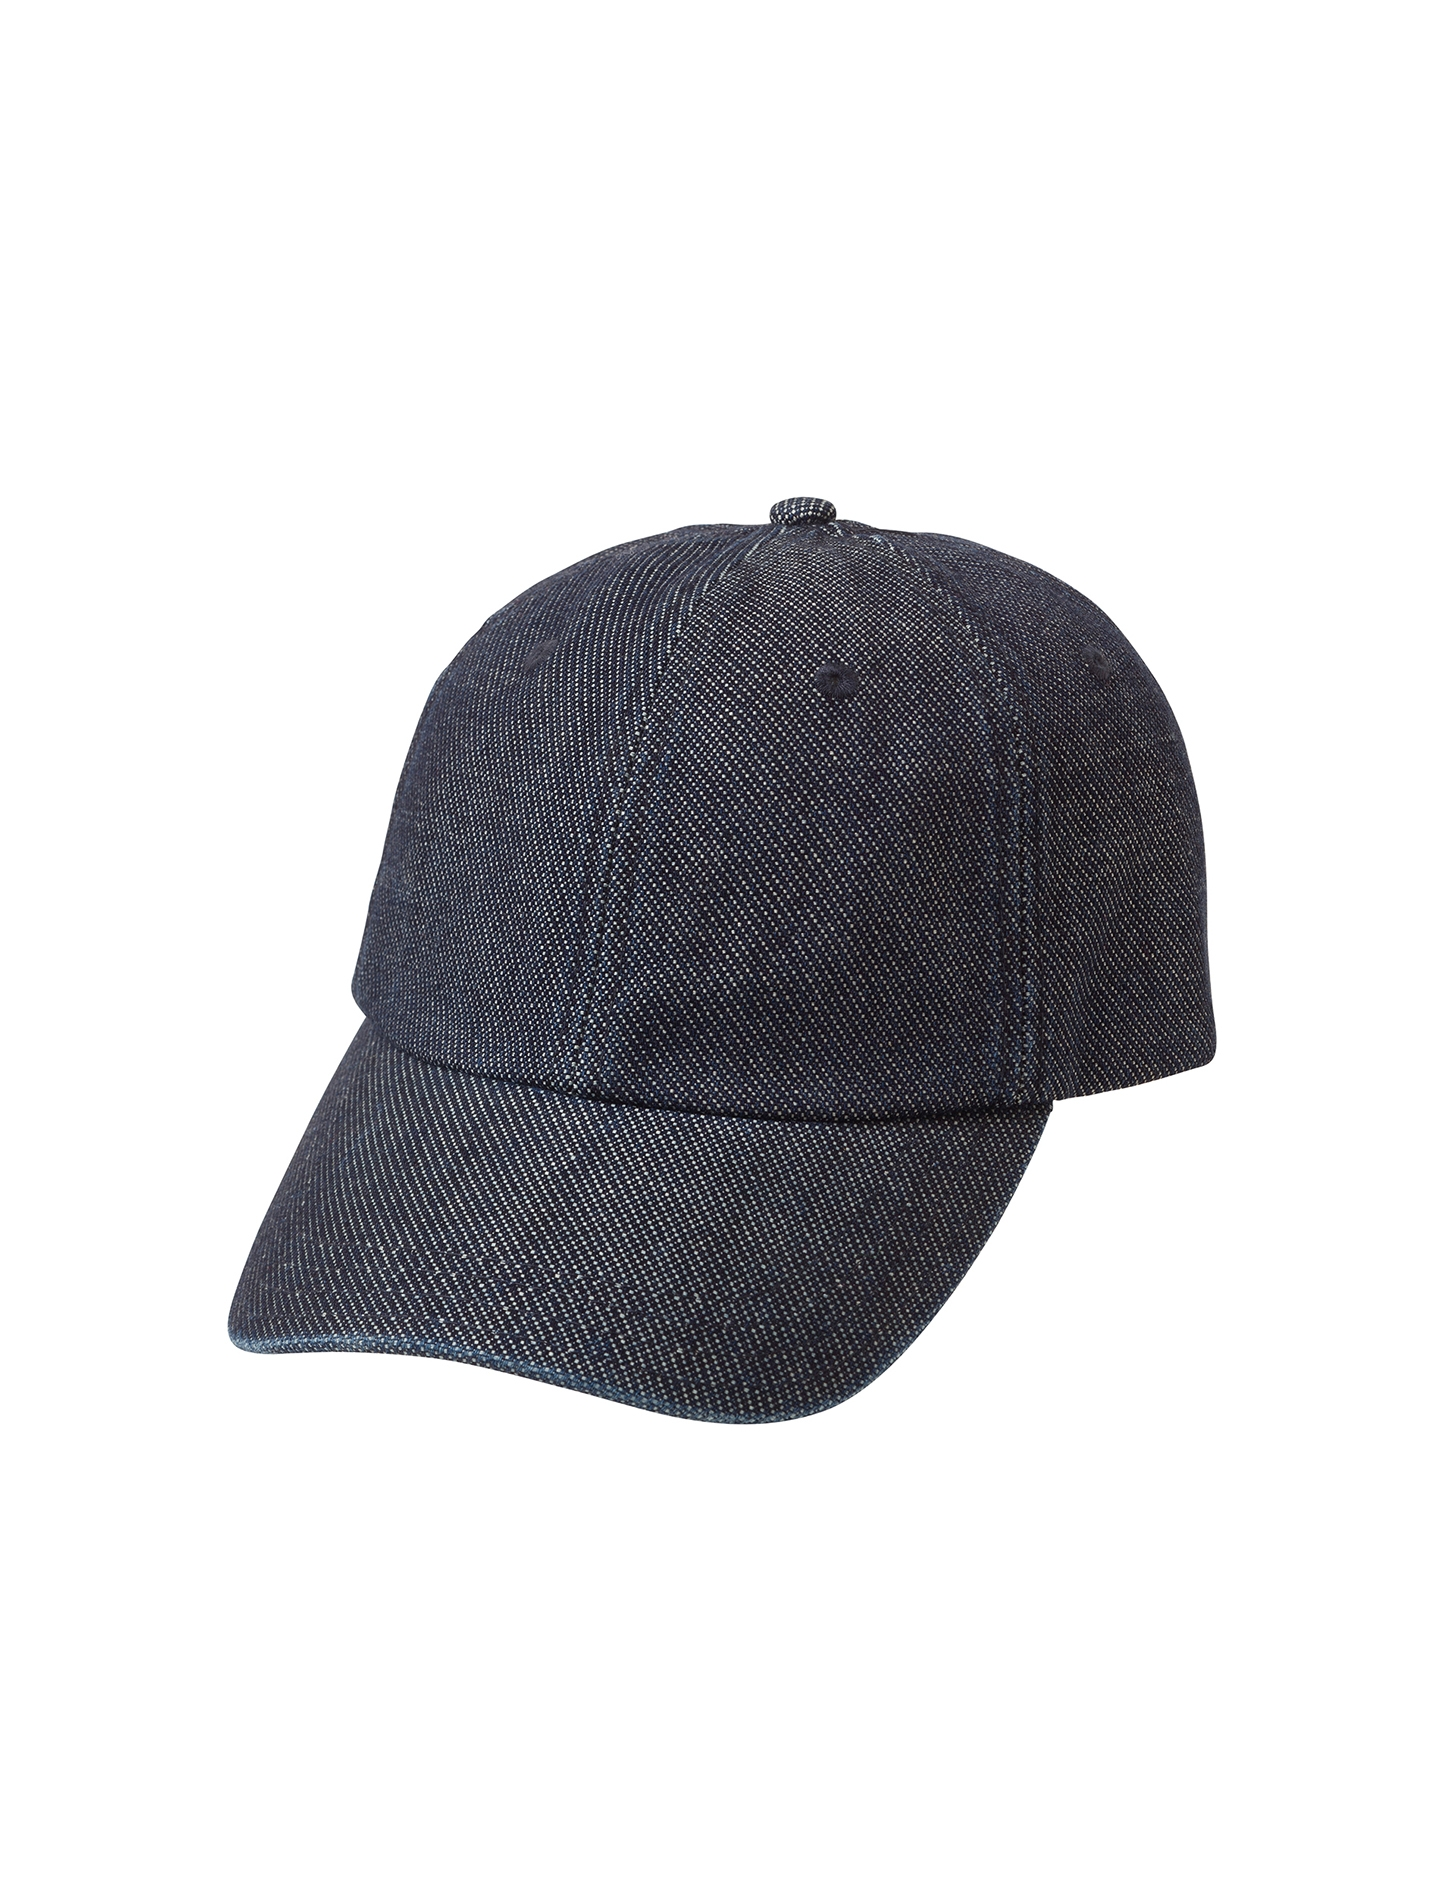 21cef5c2 Alternative Basic Chino Cap, Dark Denim — Iowa Dad Hats